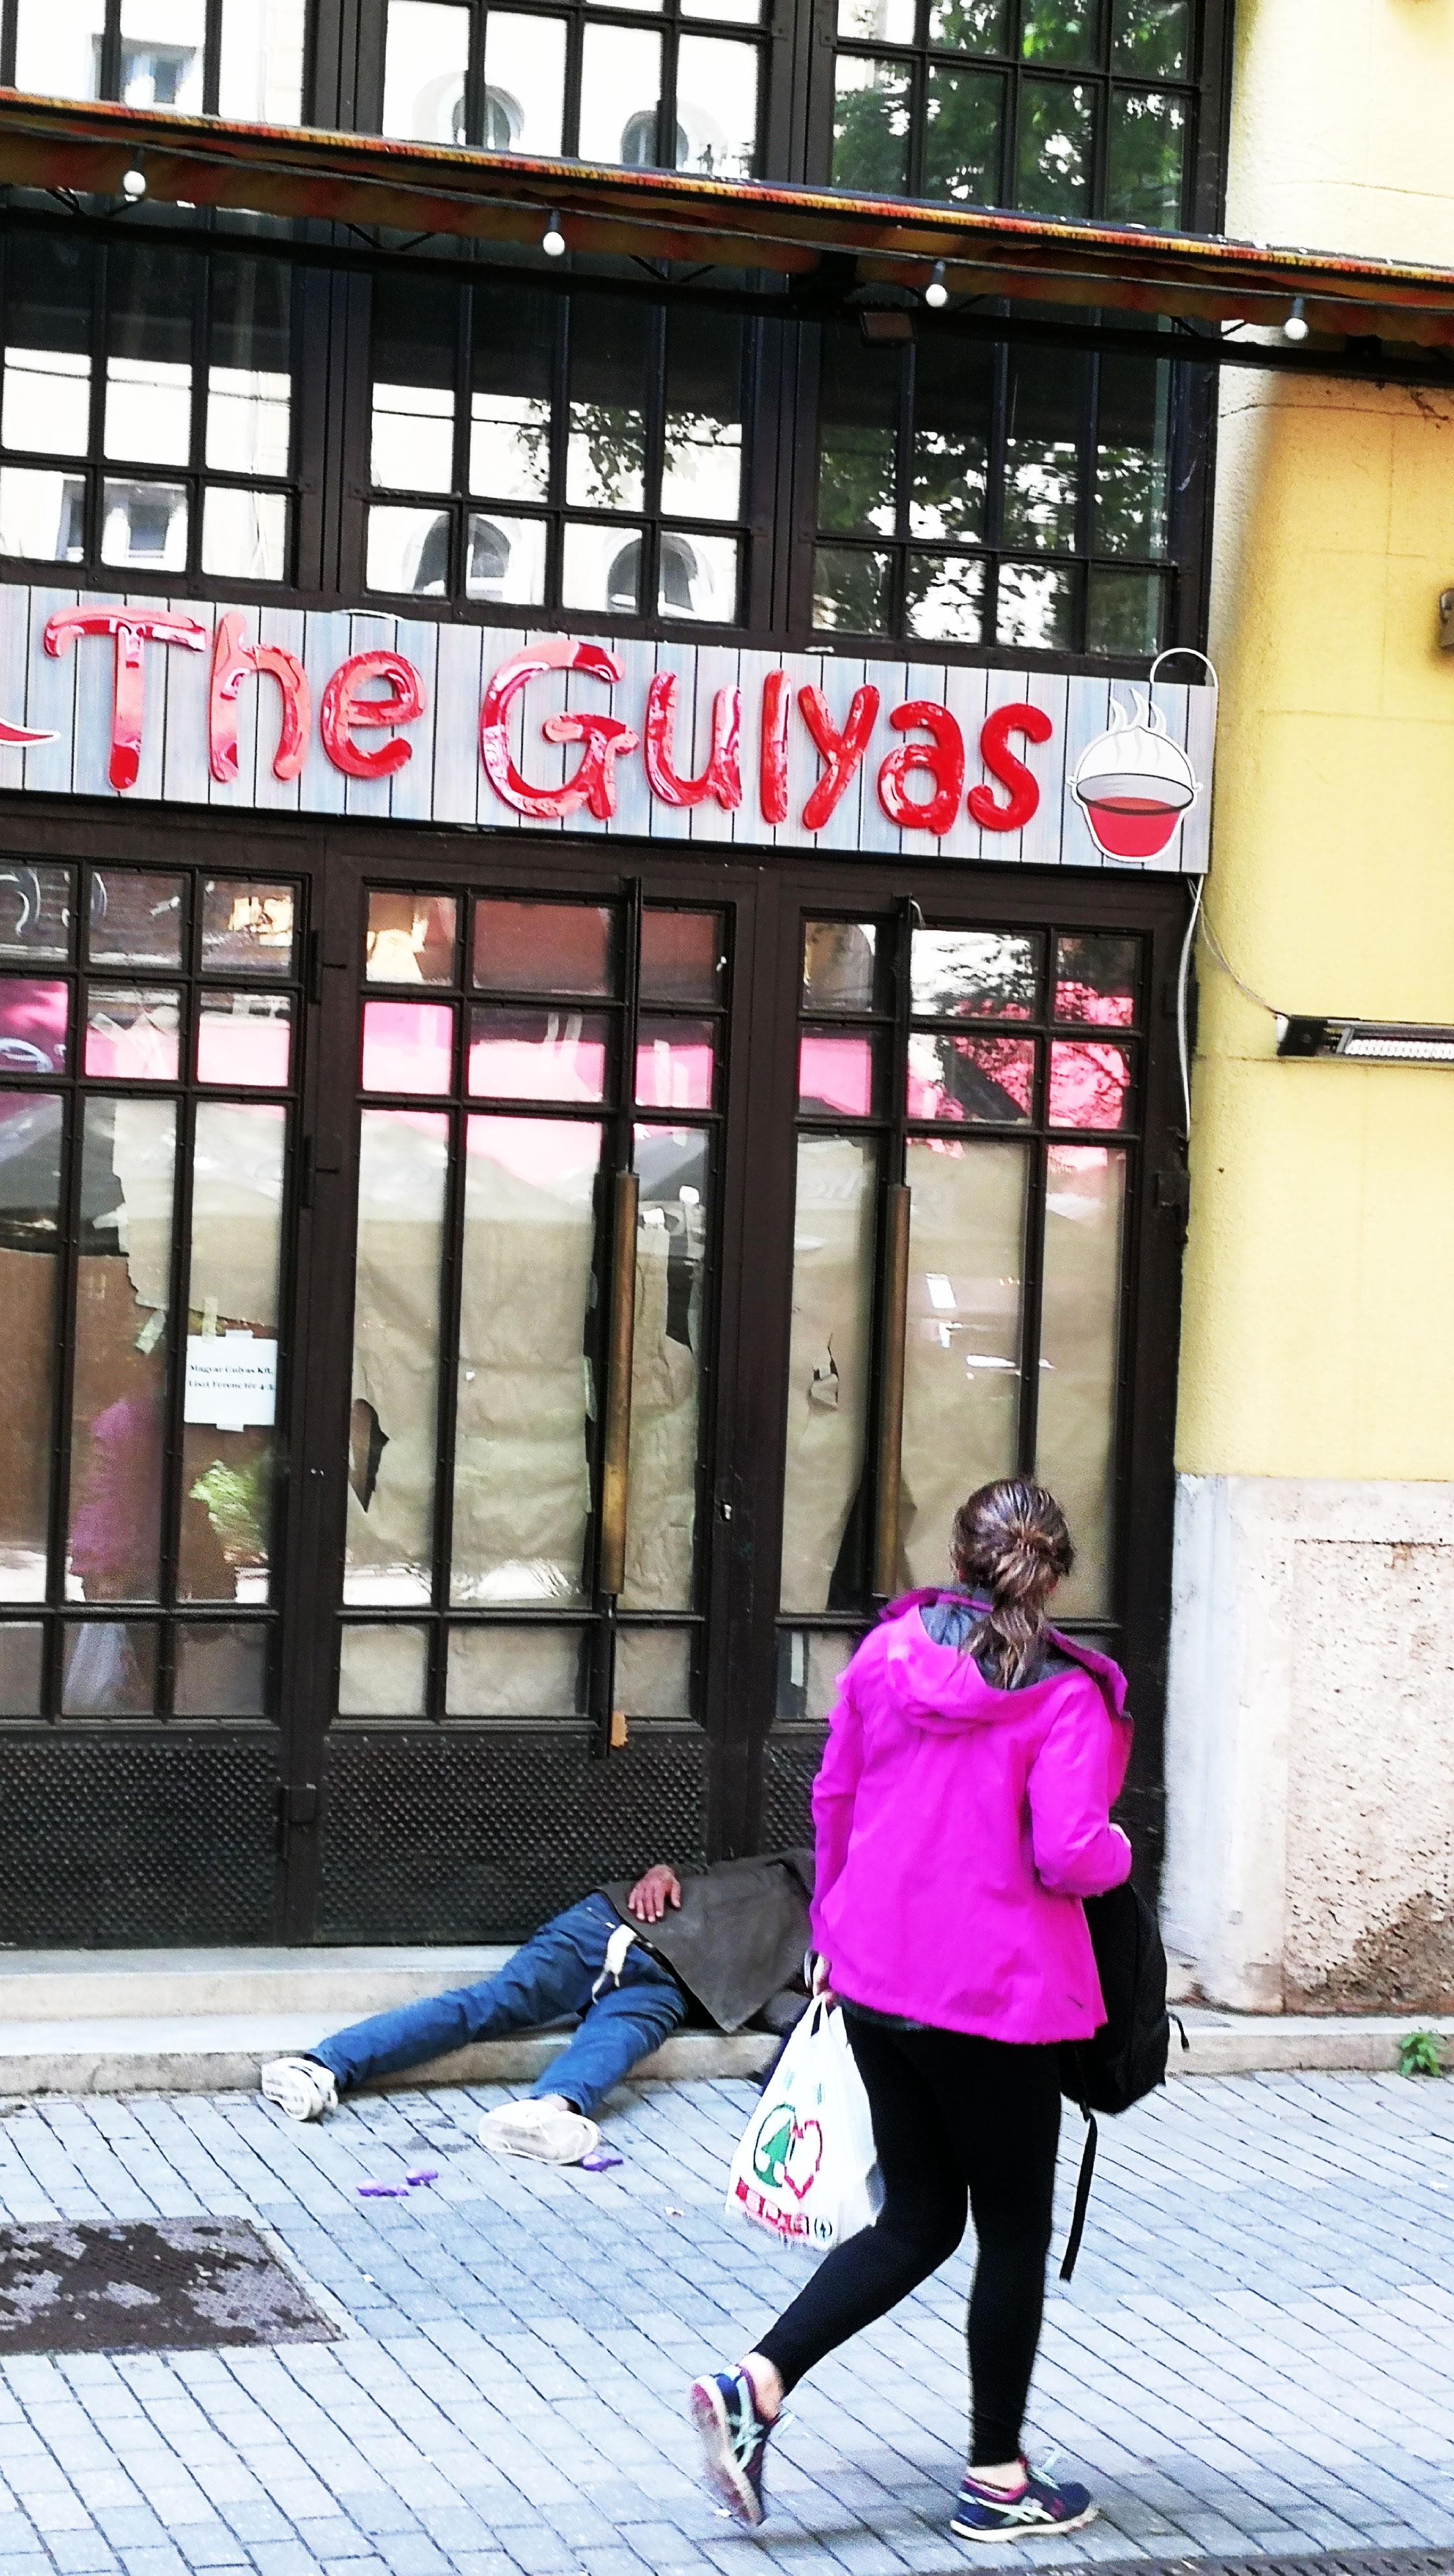 the-goulyas-2.jpg